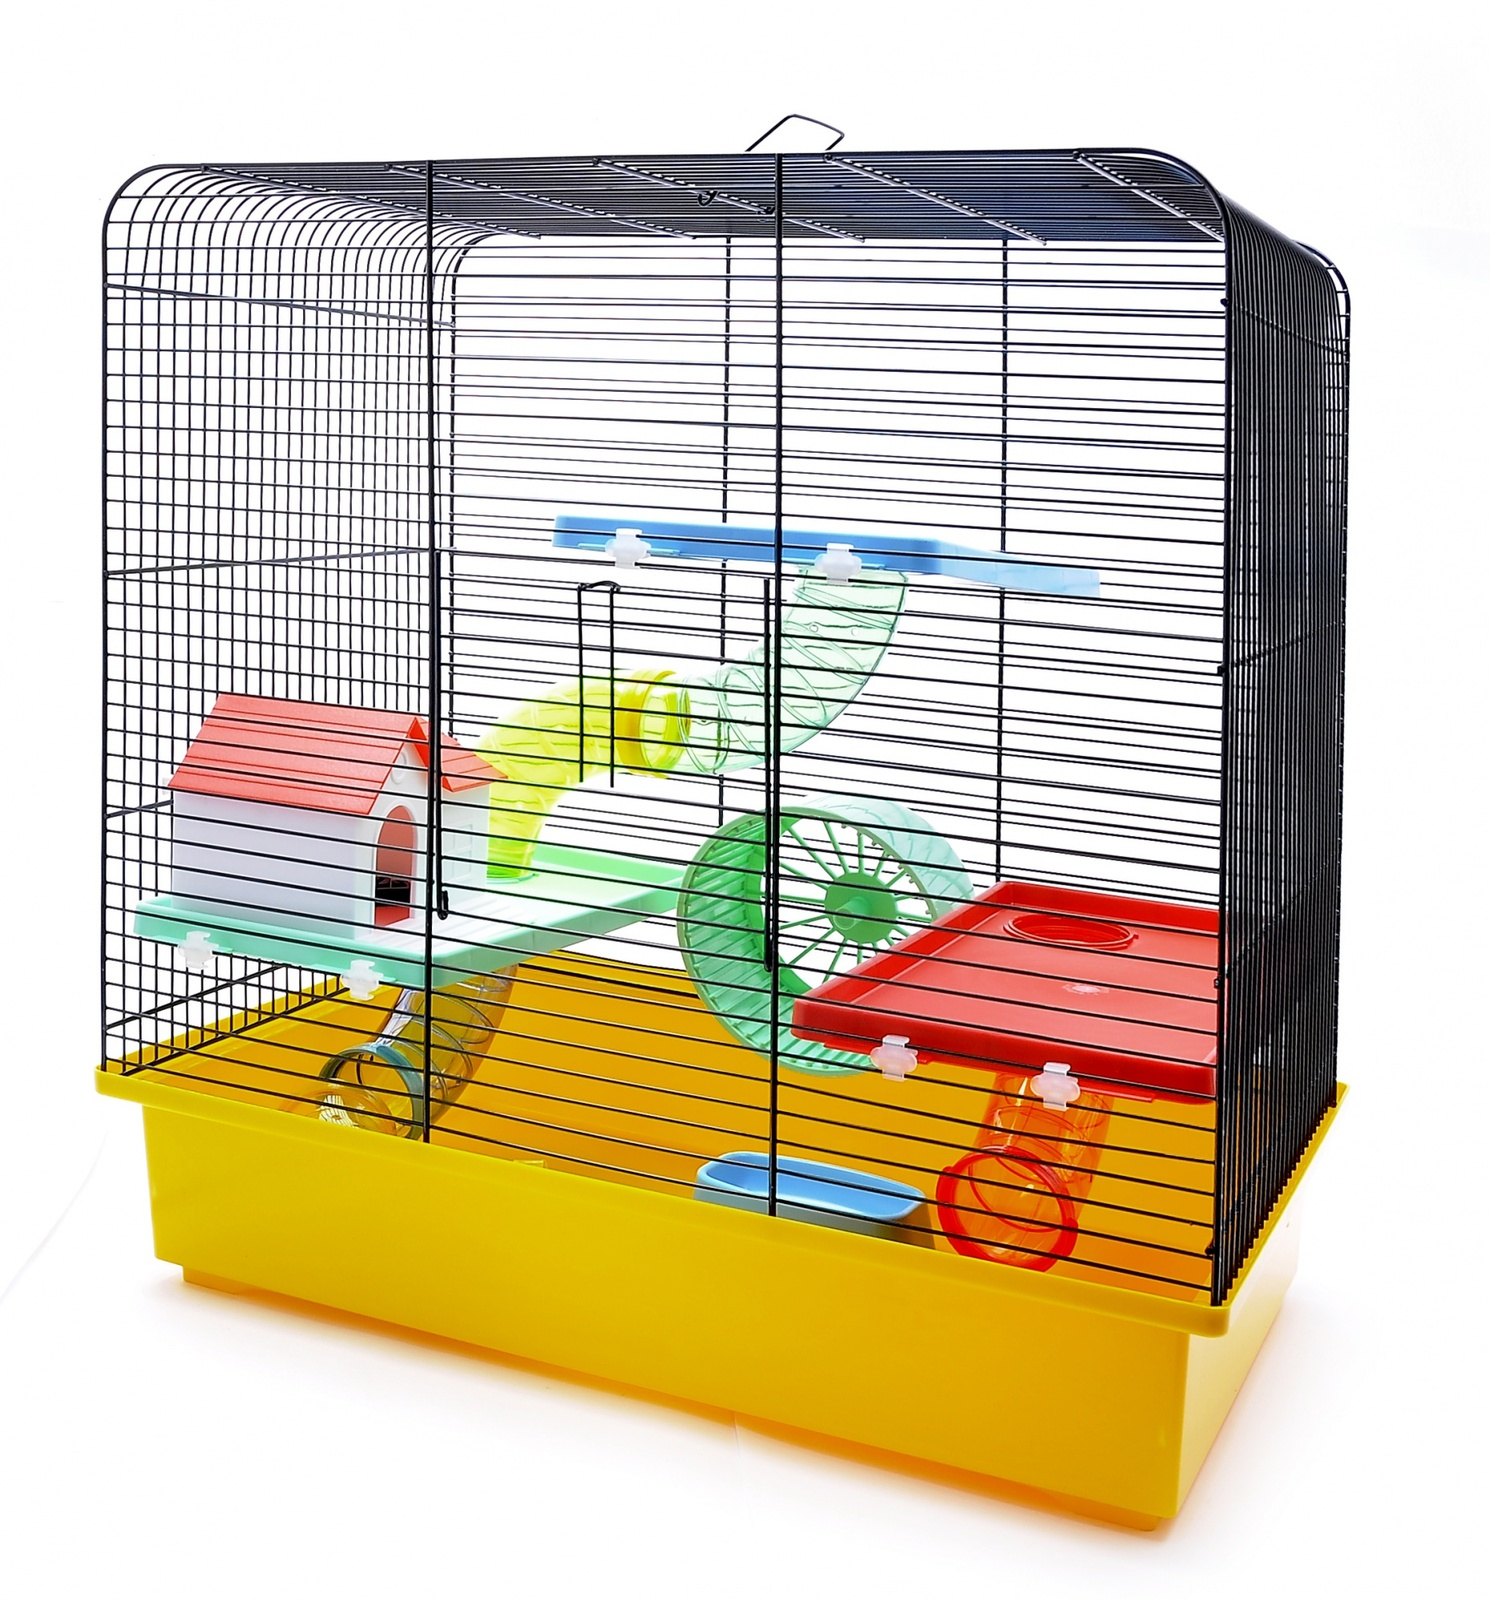 benelux Benelux Клетка для хомяков Валерия 49 * 32,5 * 52,5 см (Cage for hamsters valerie funny) 35131 31461